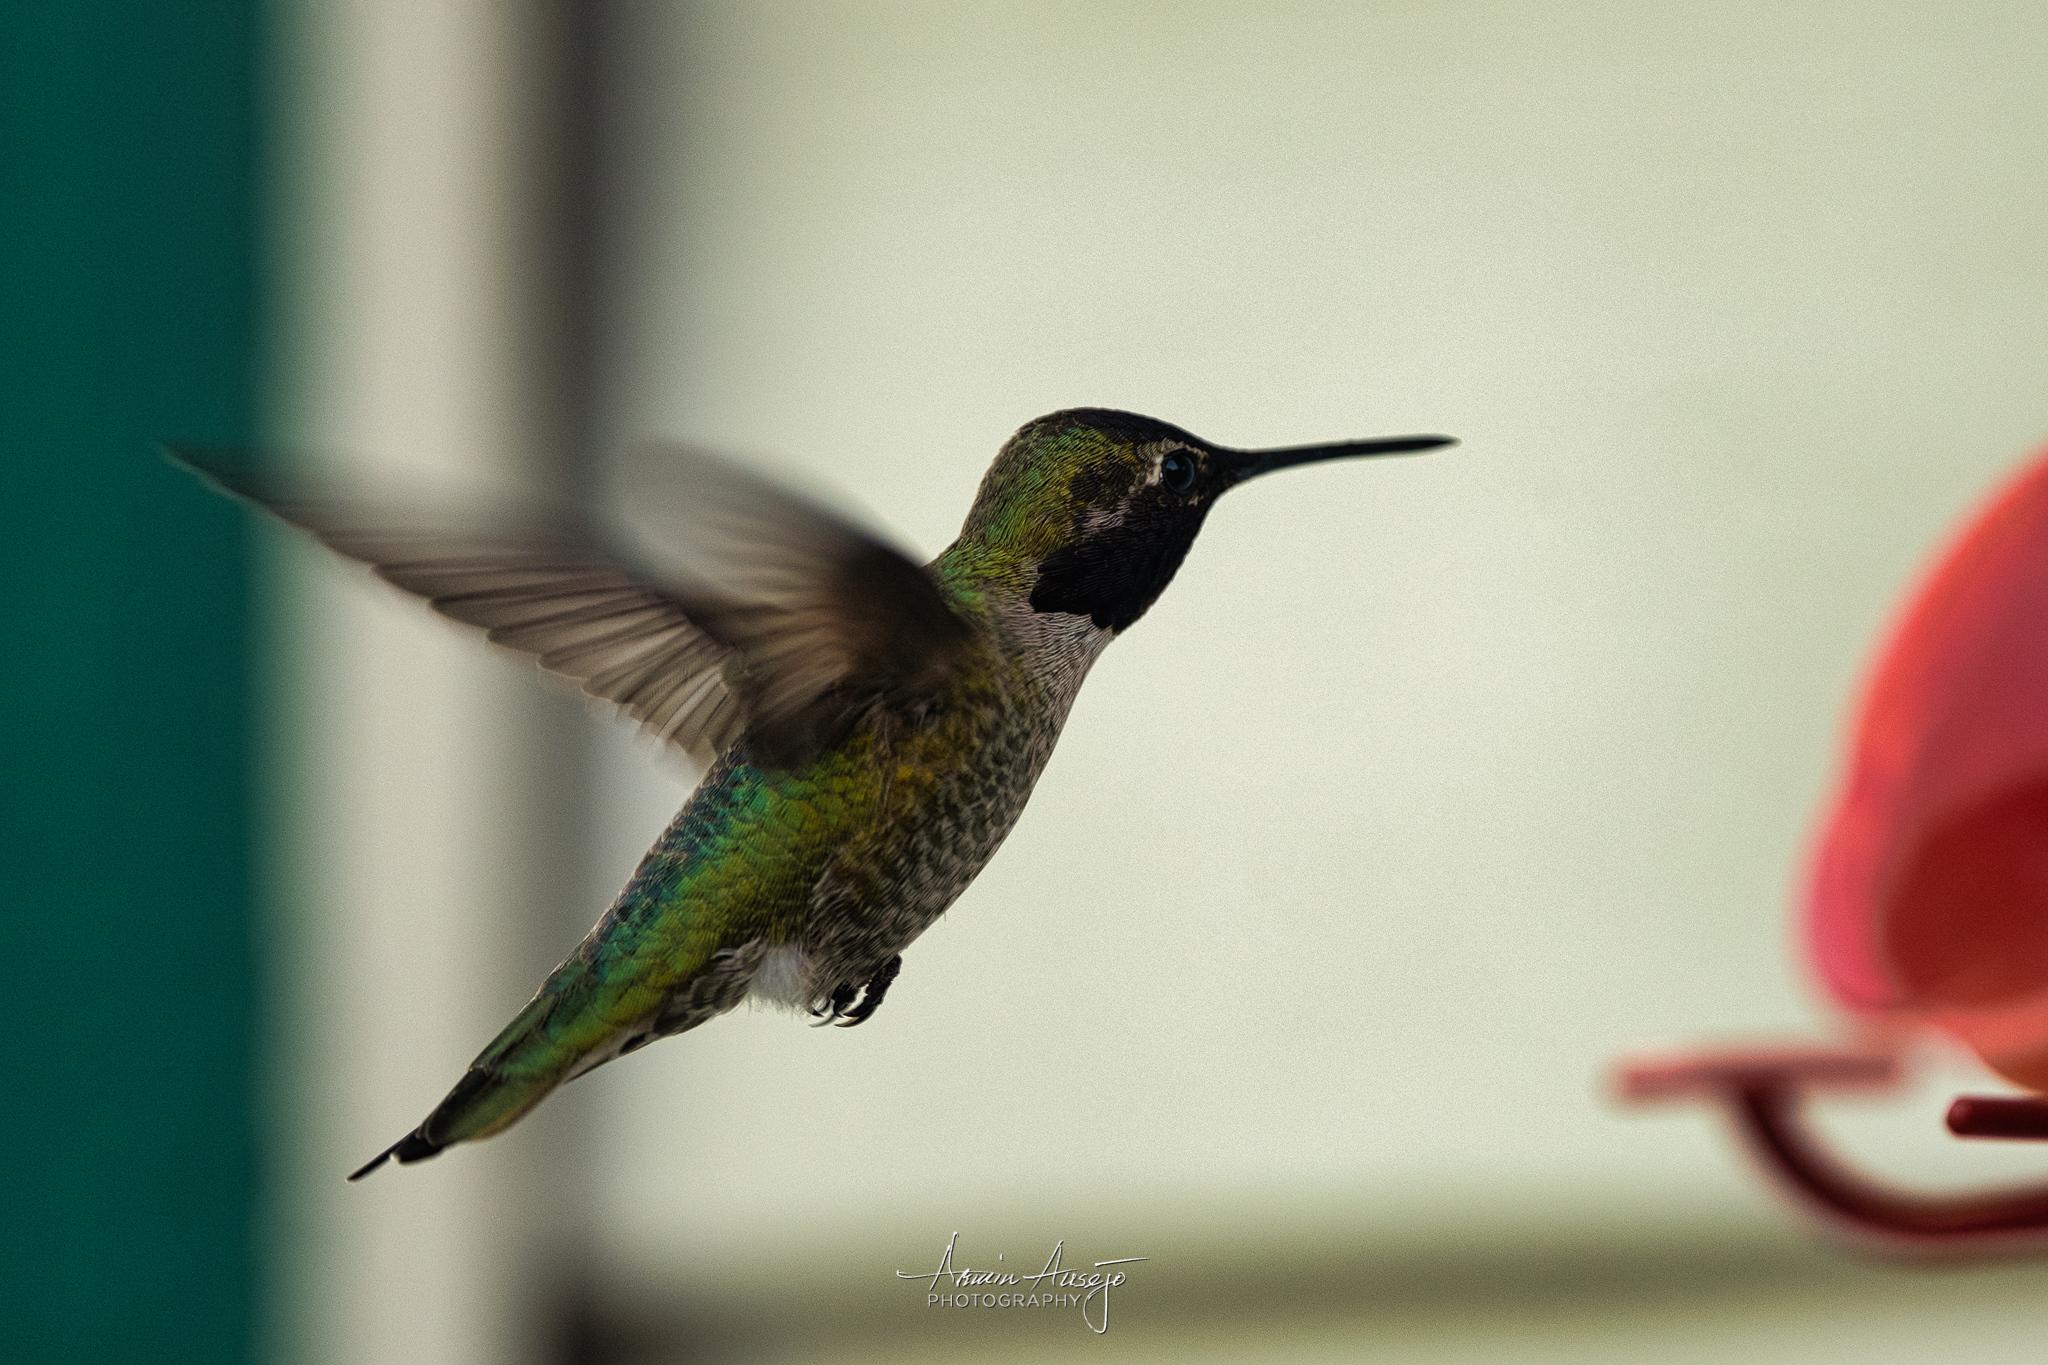 Hummingbird in flight with the Nikkor 300mm f/4E PF ED VR